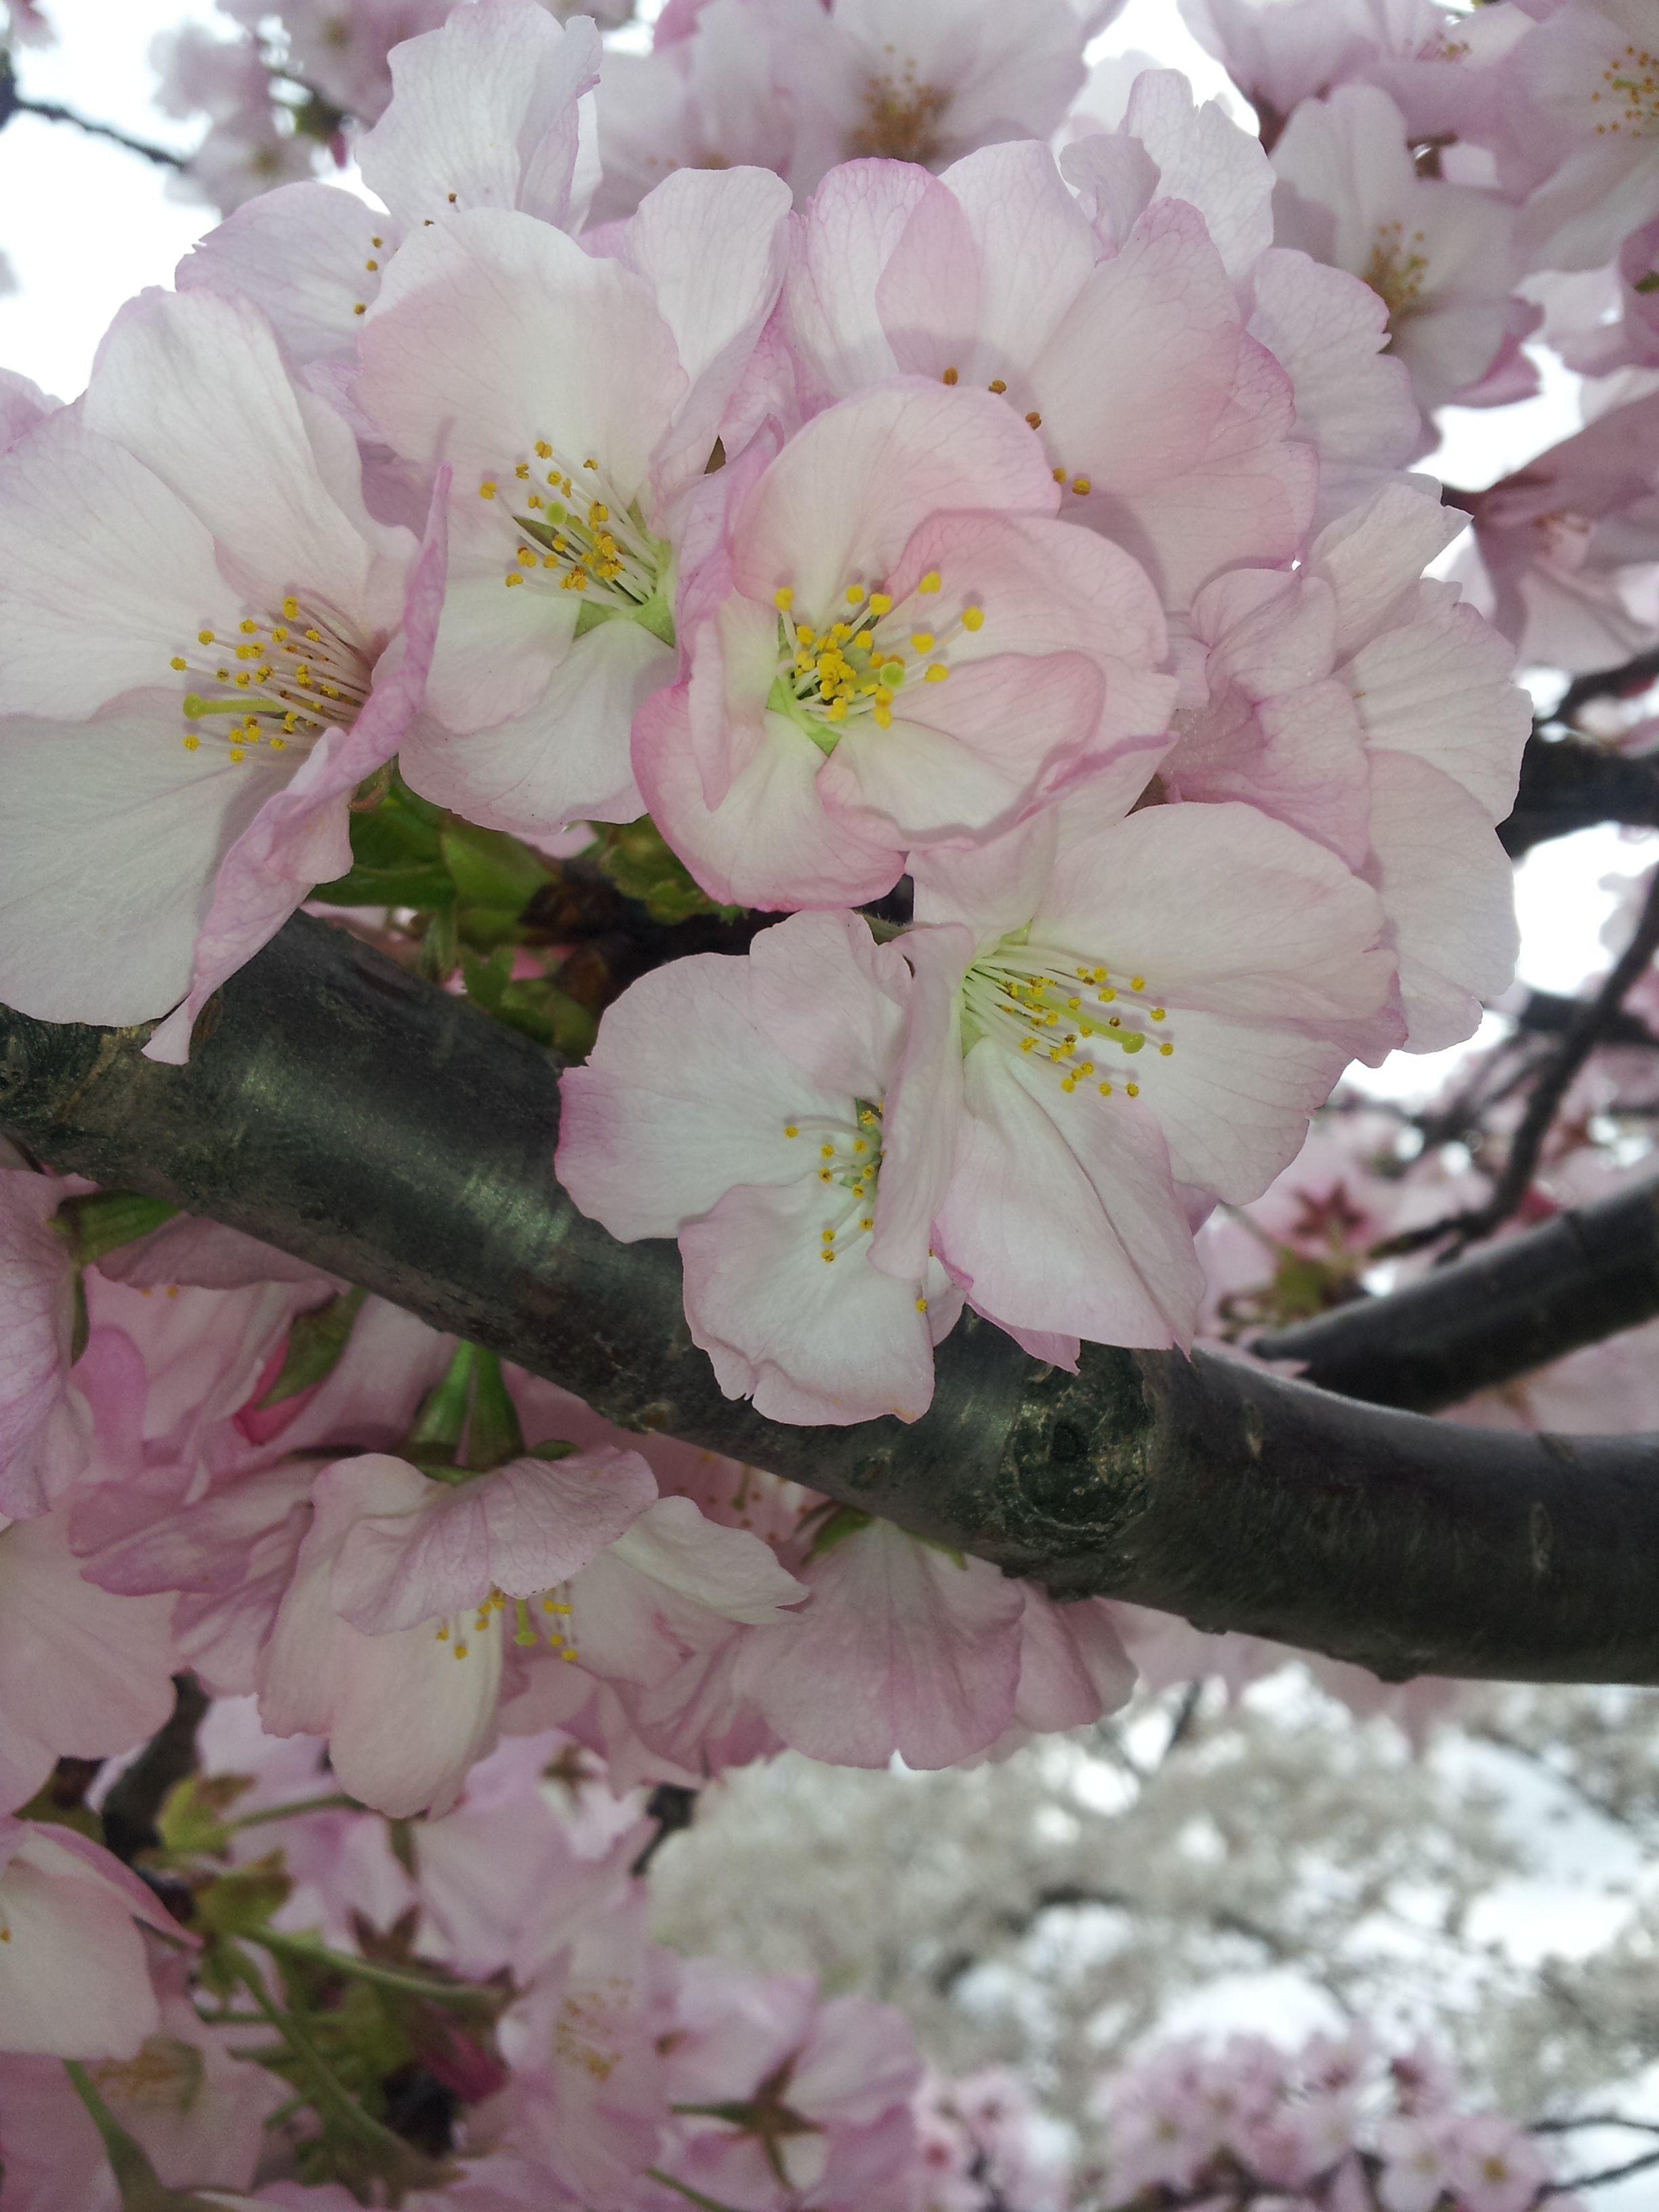 Cherry Blossom Trees In Washington Dc Cherry Blossom Tree Blossom Trees Amazing Flowers